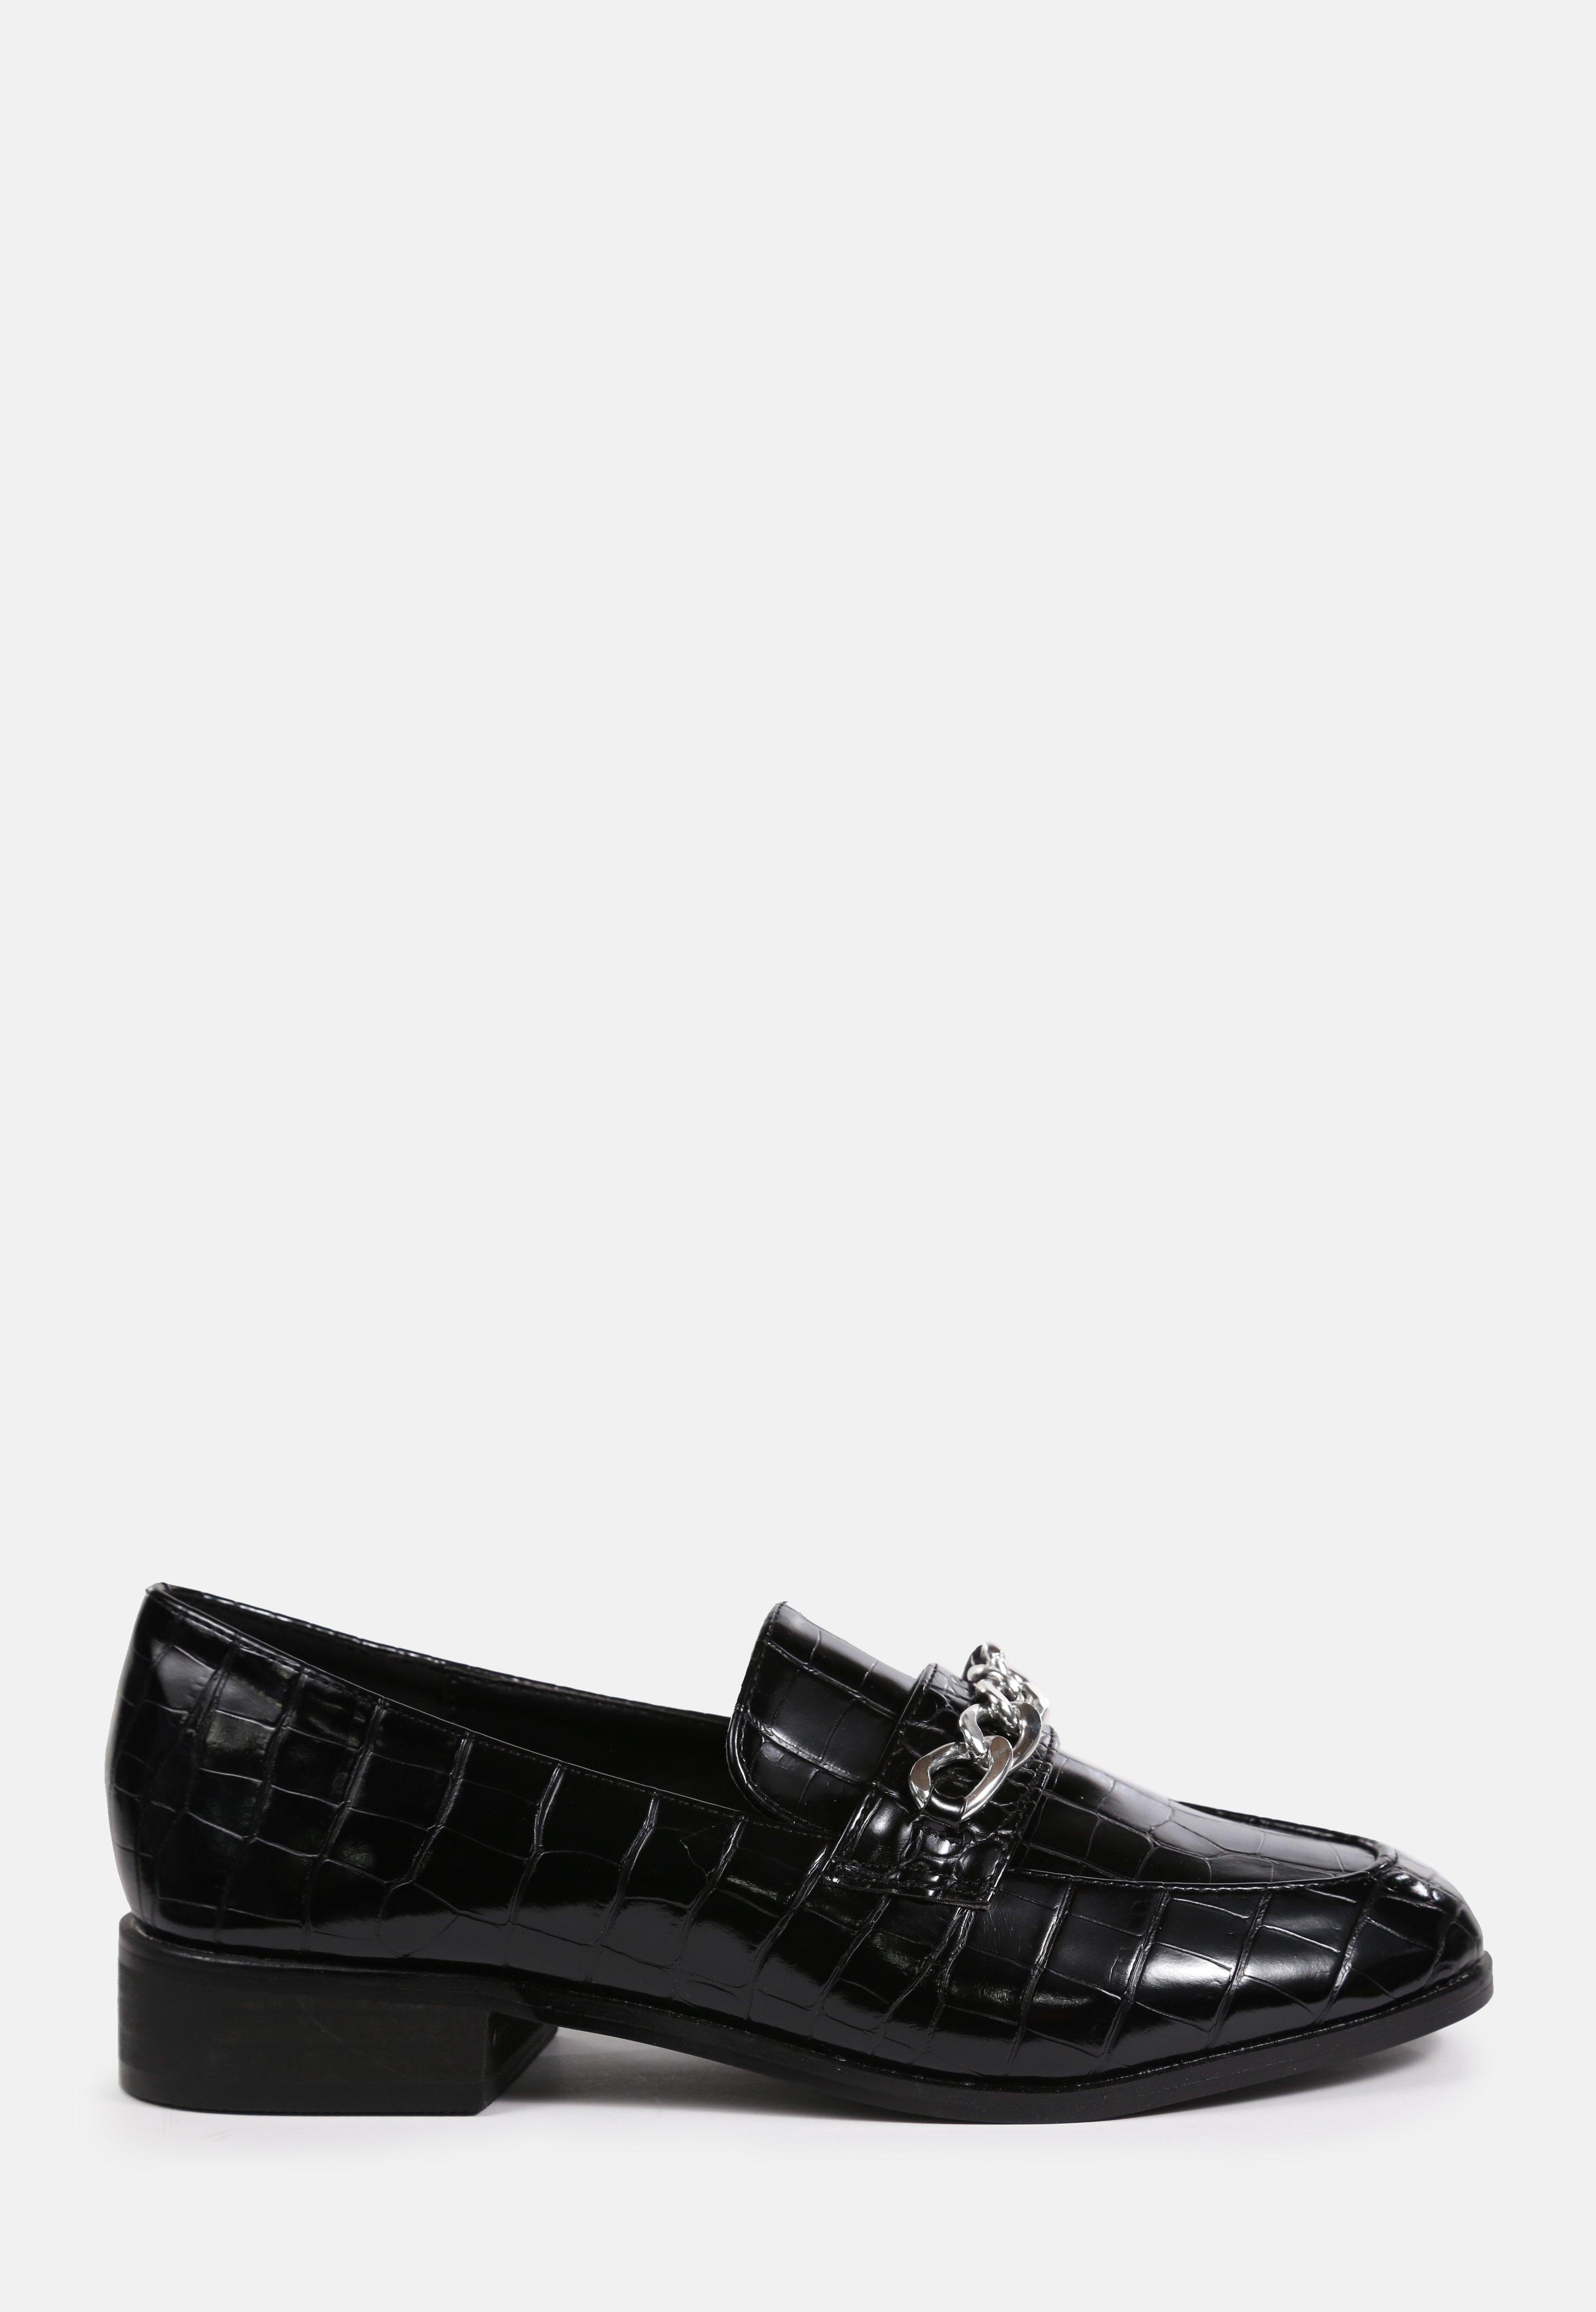 Loafer in Kroko Optik mit Ketten Detail in Schwarz